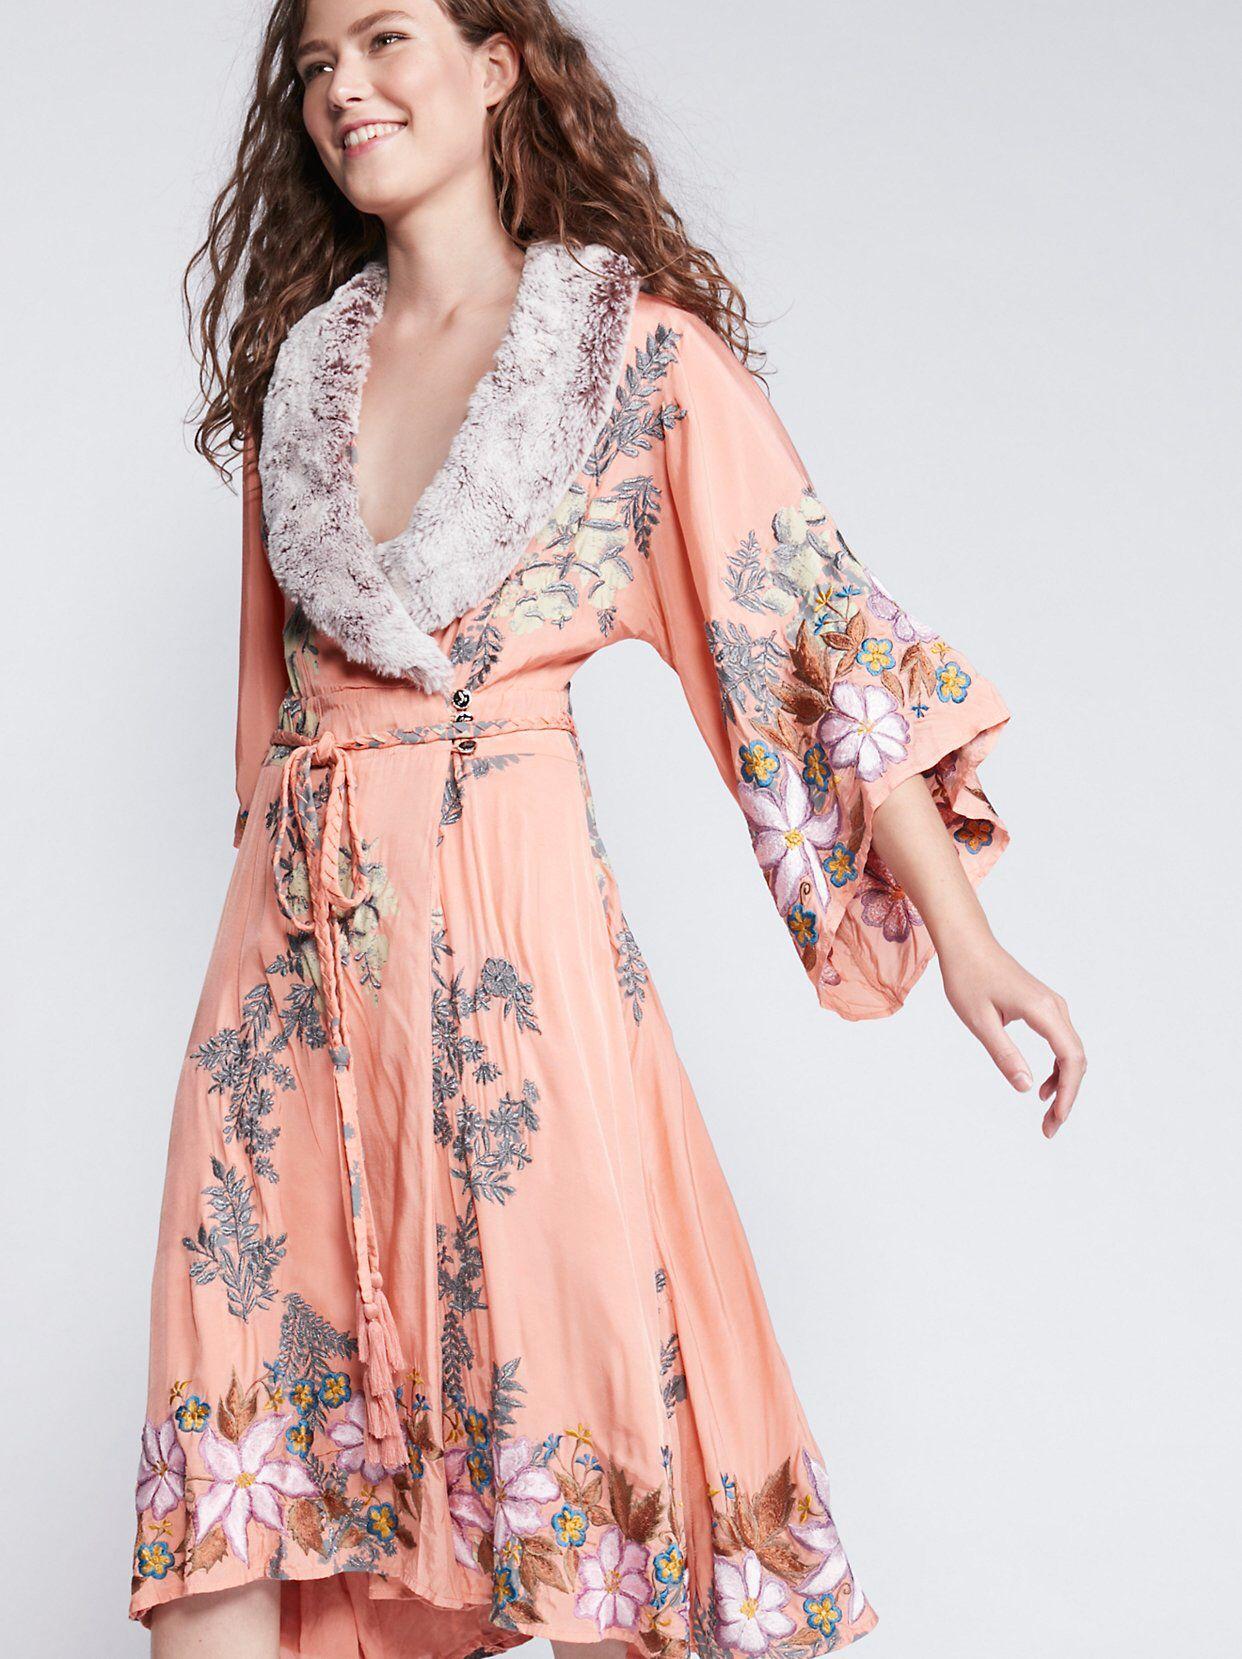 Excelente Vestido De Novia Nicole Richie Ornamento - Ideas de ...